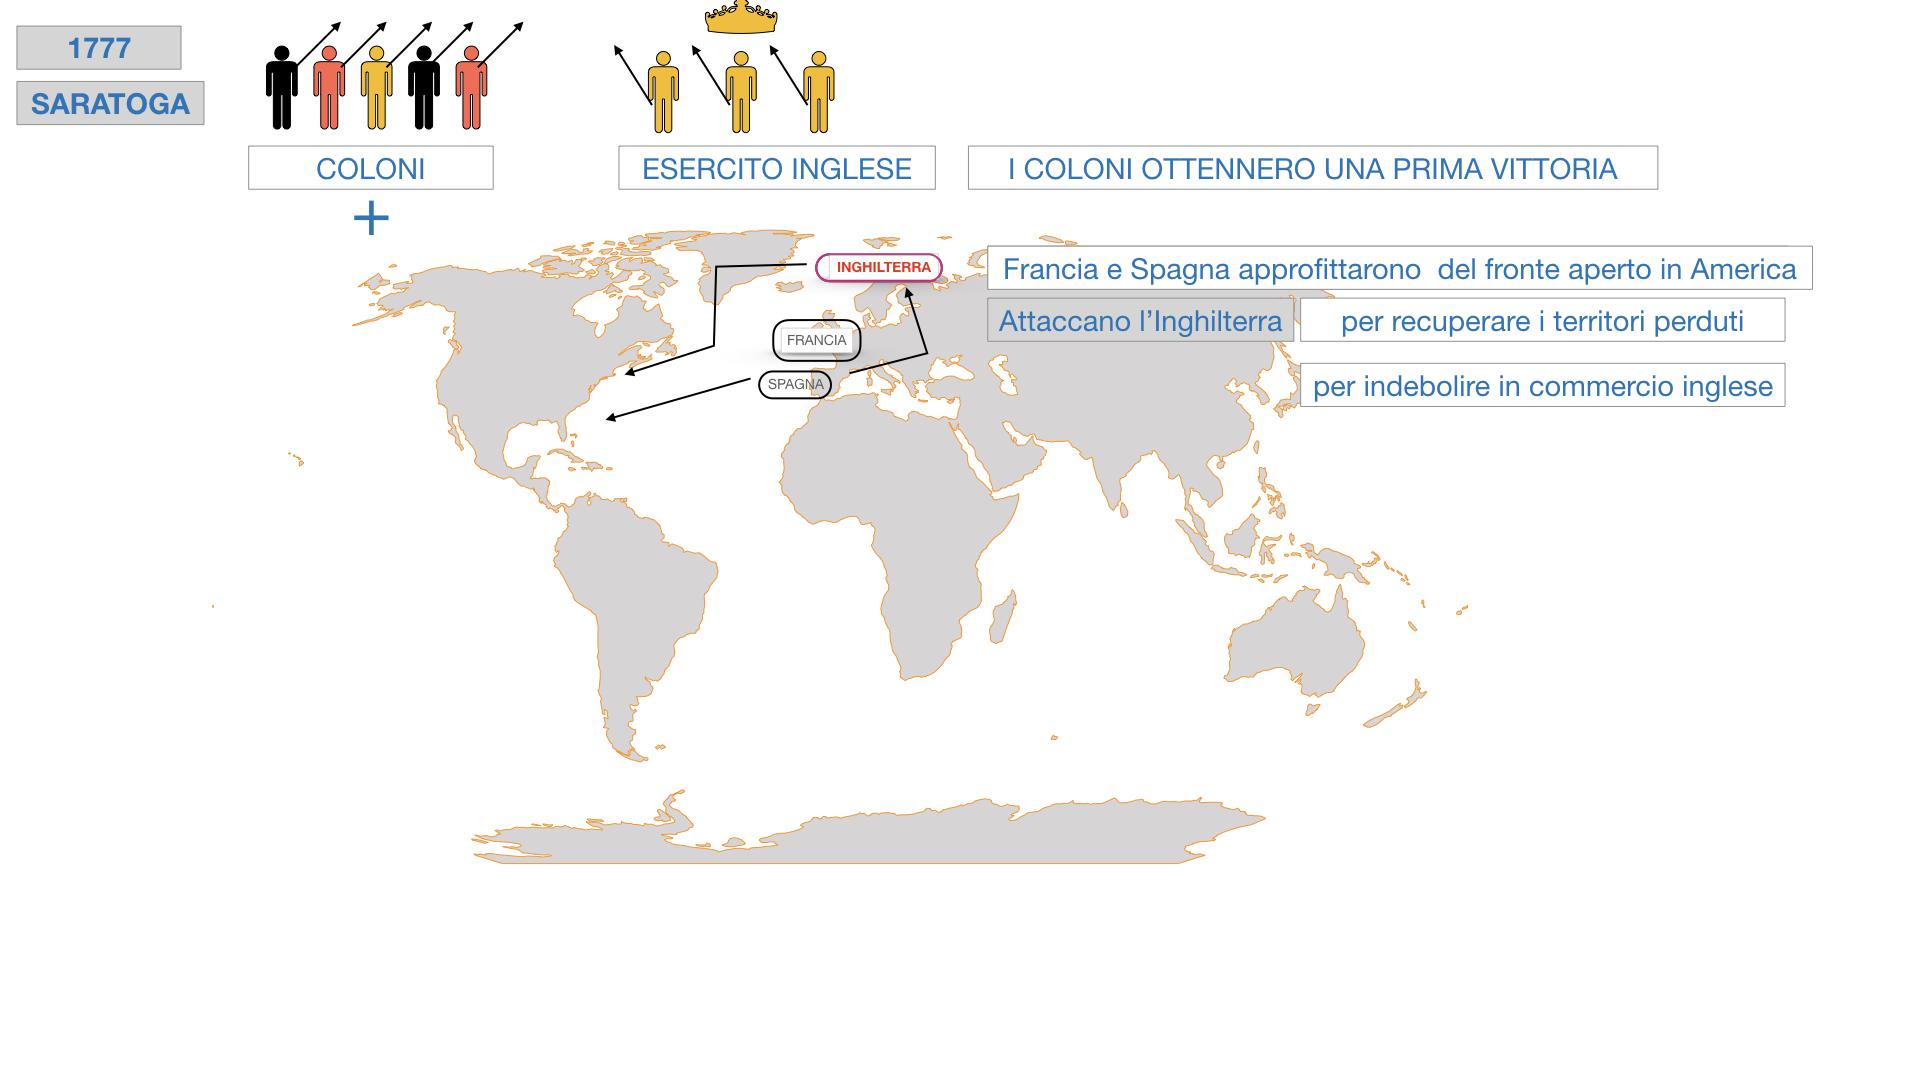 GUERRA DI INDIPENDENZA AMERICANA_SIMULAZIONE.128